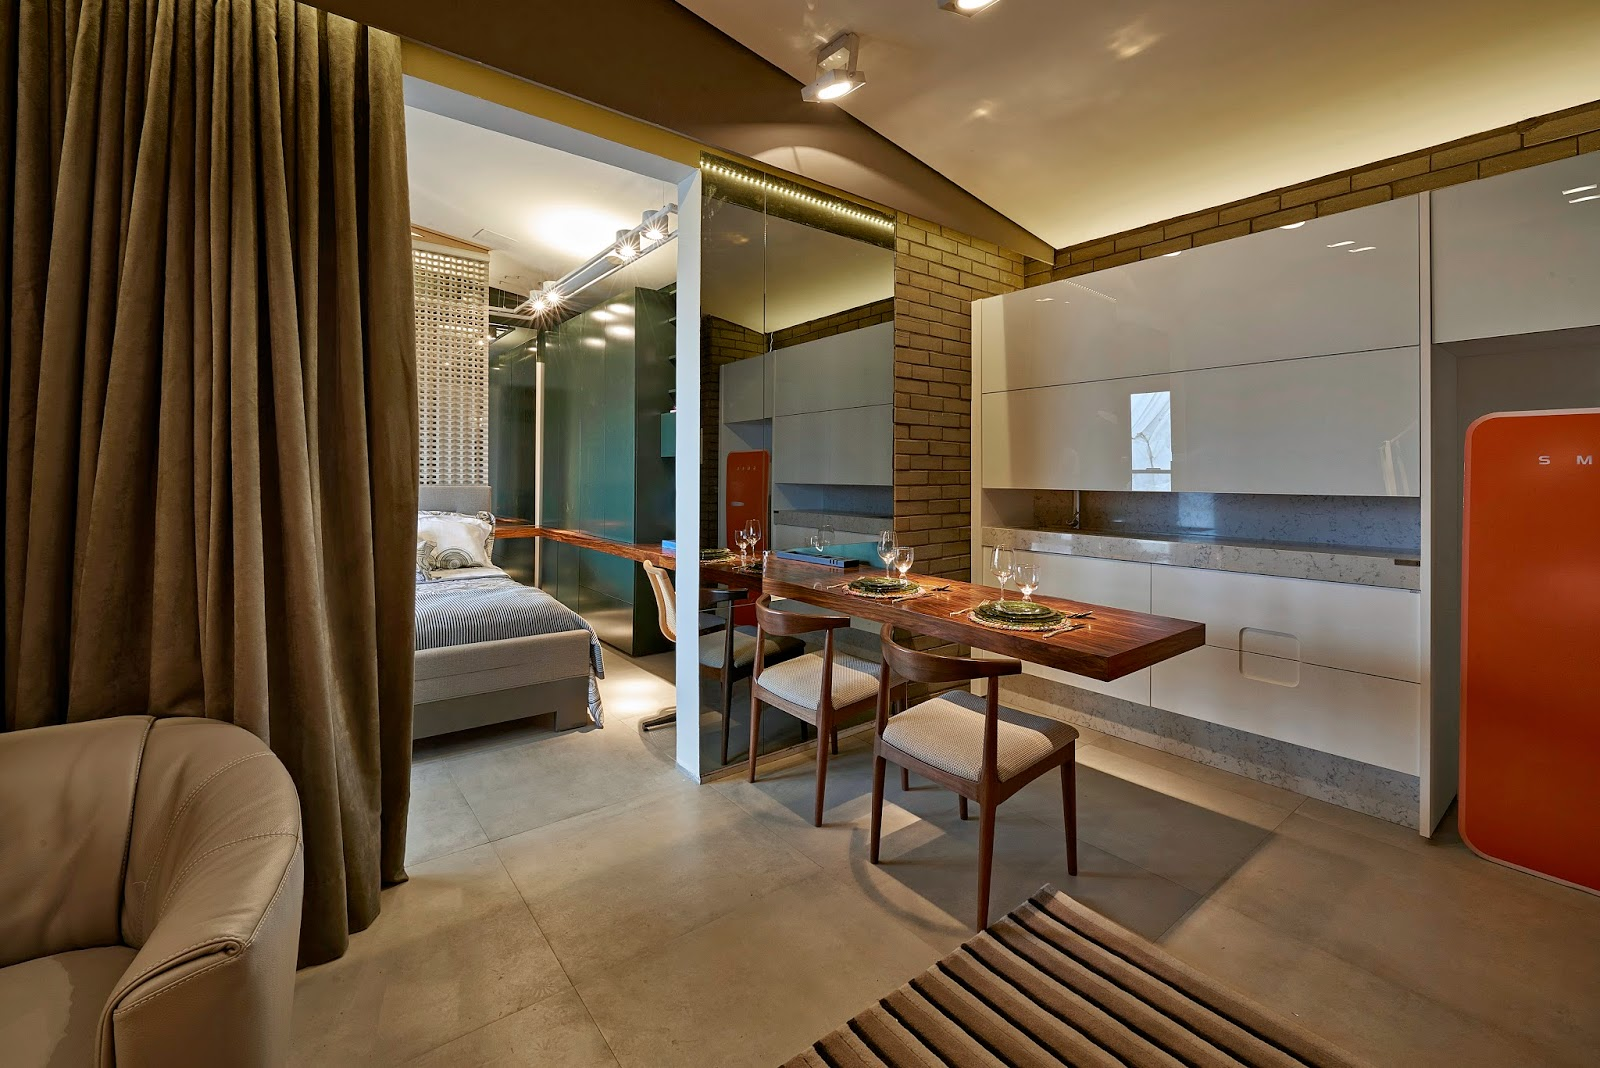 Dena interiores : loft casa cor mg